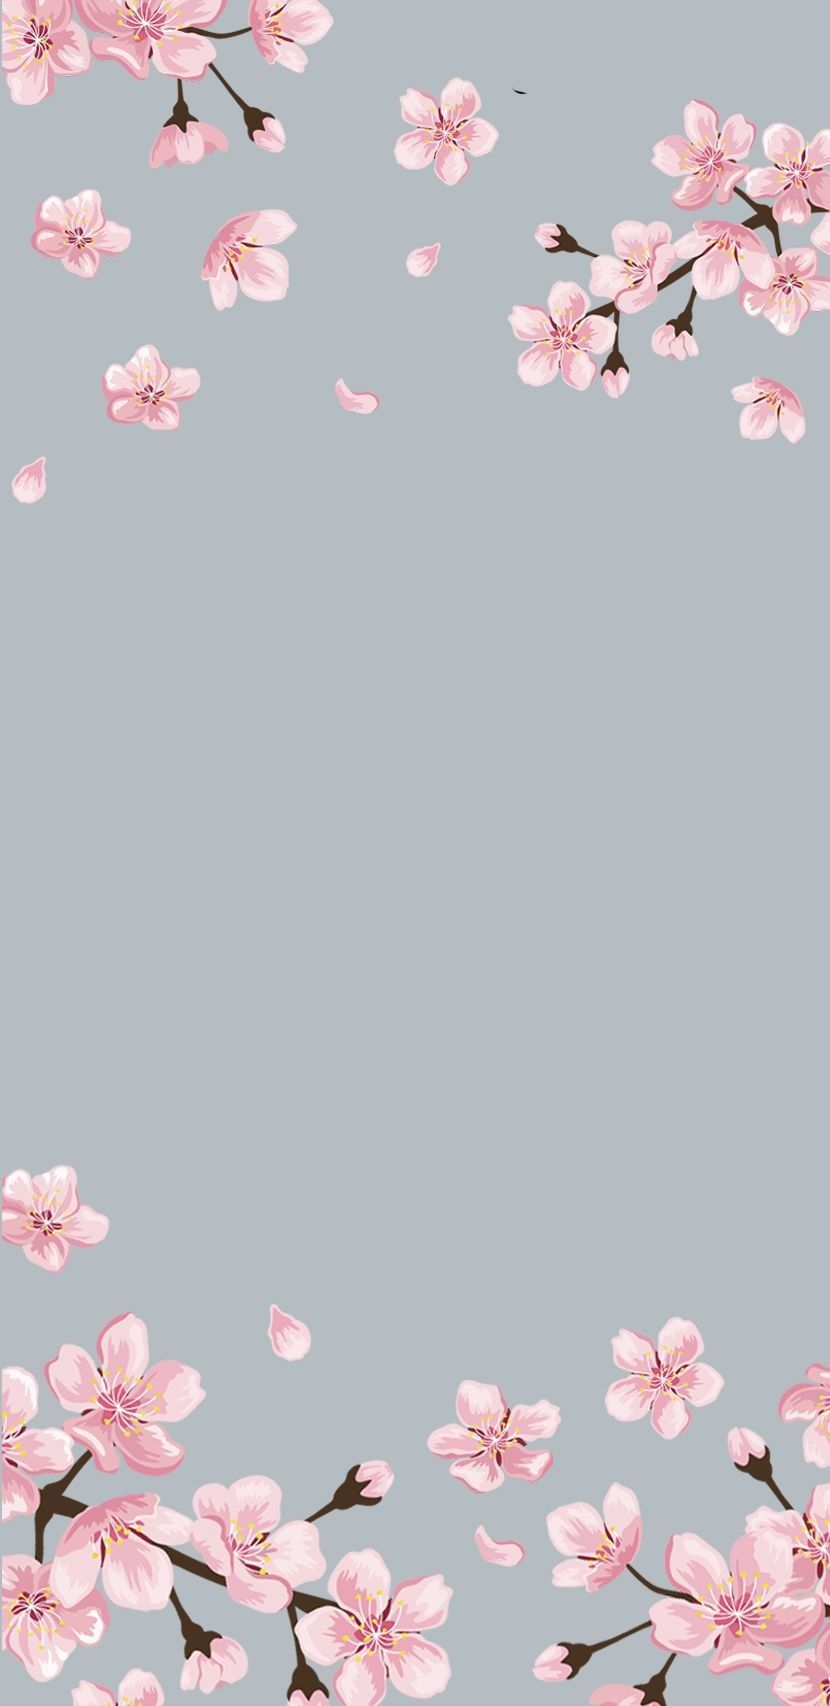 Pouvoir Des Fleurs Beauty Iphone Wallpaper Flower Wallpaper Floral Wallpaper